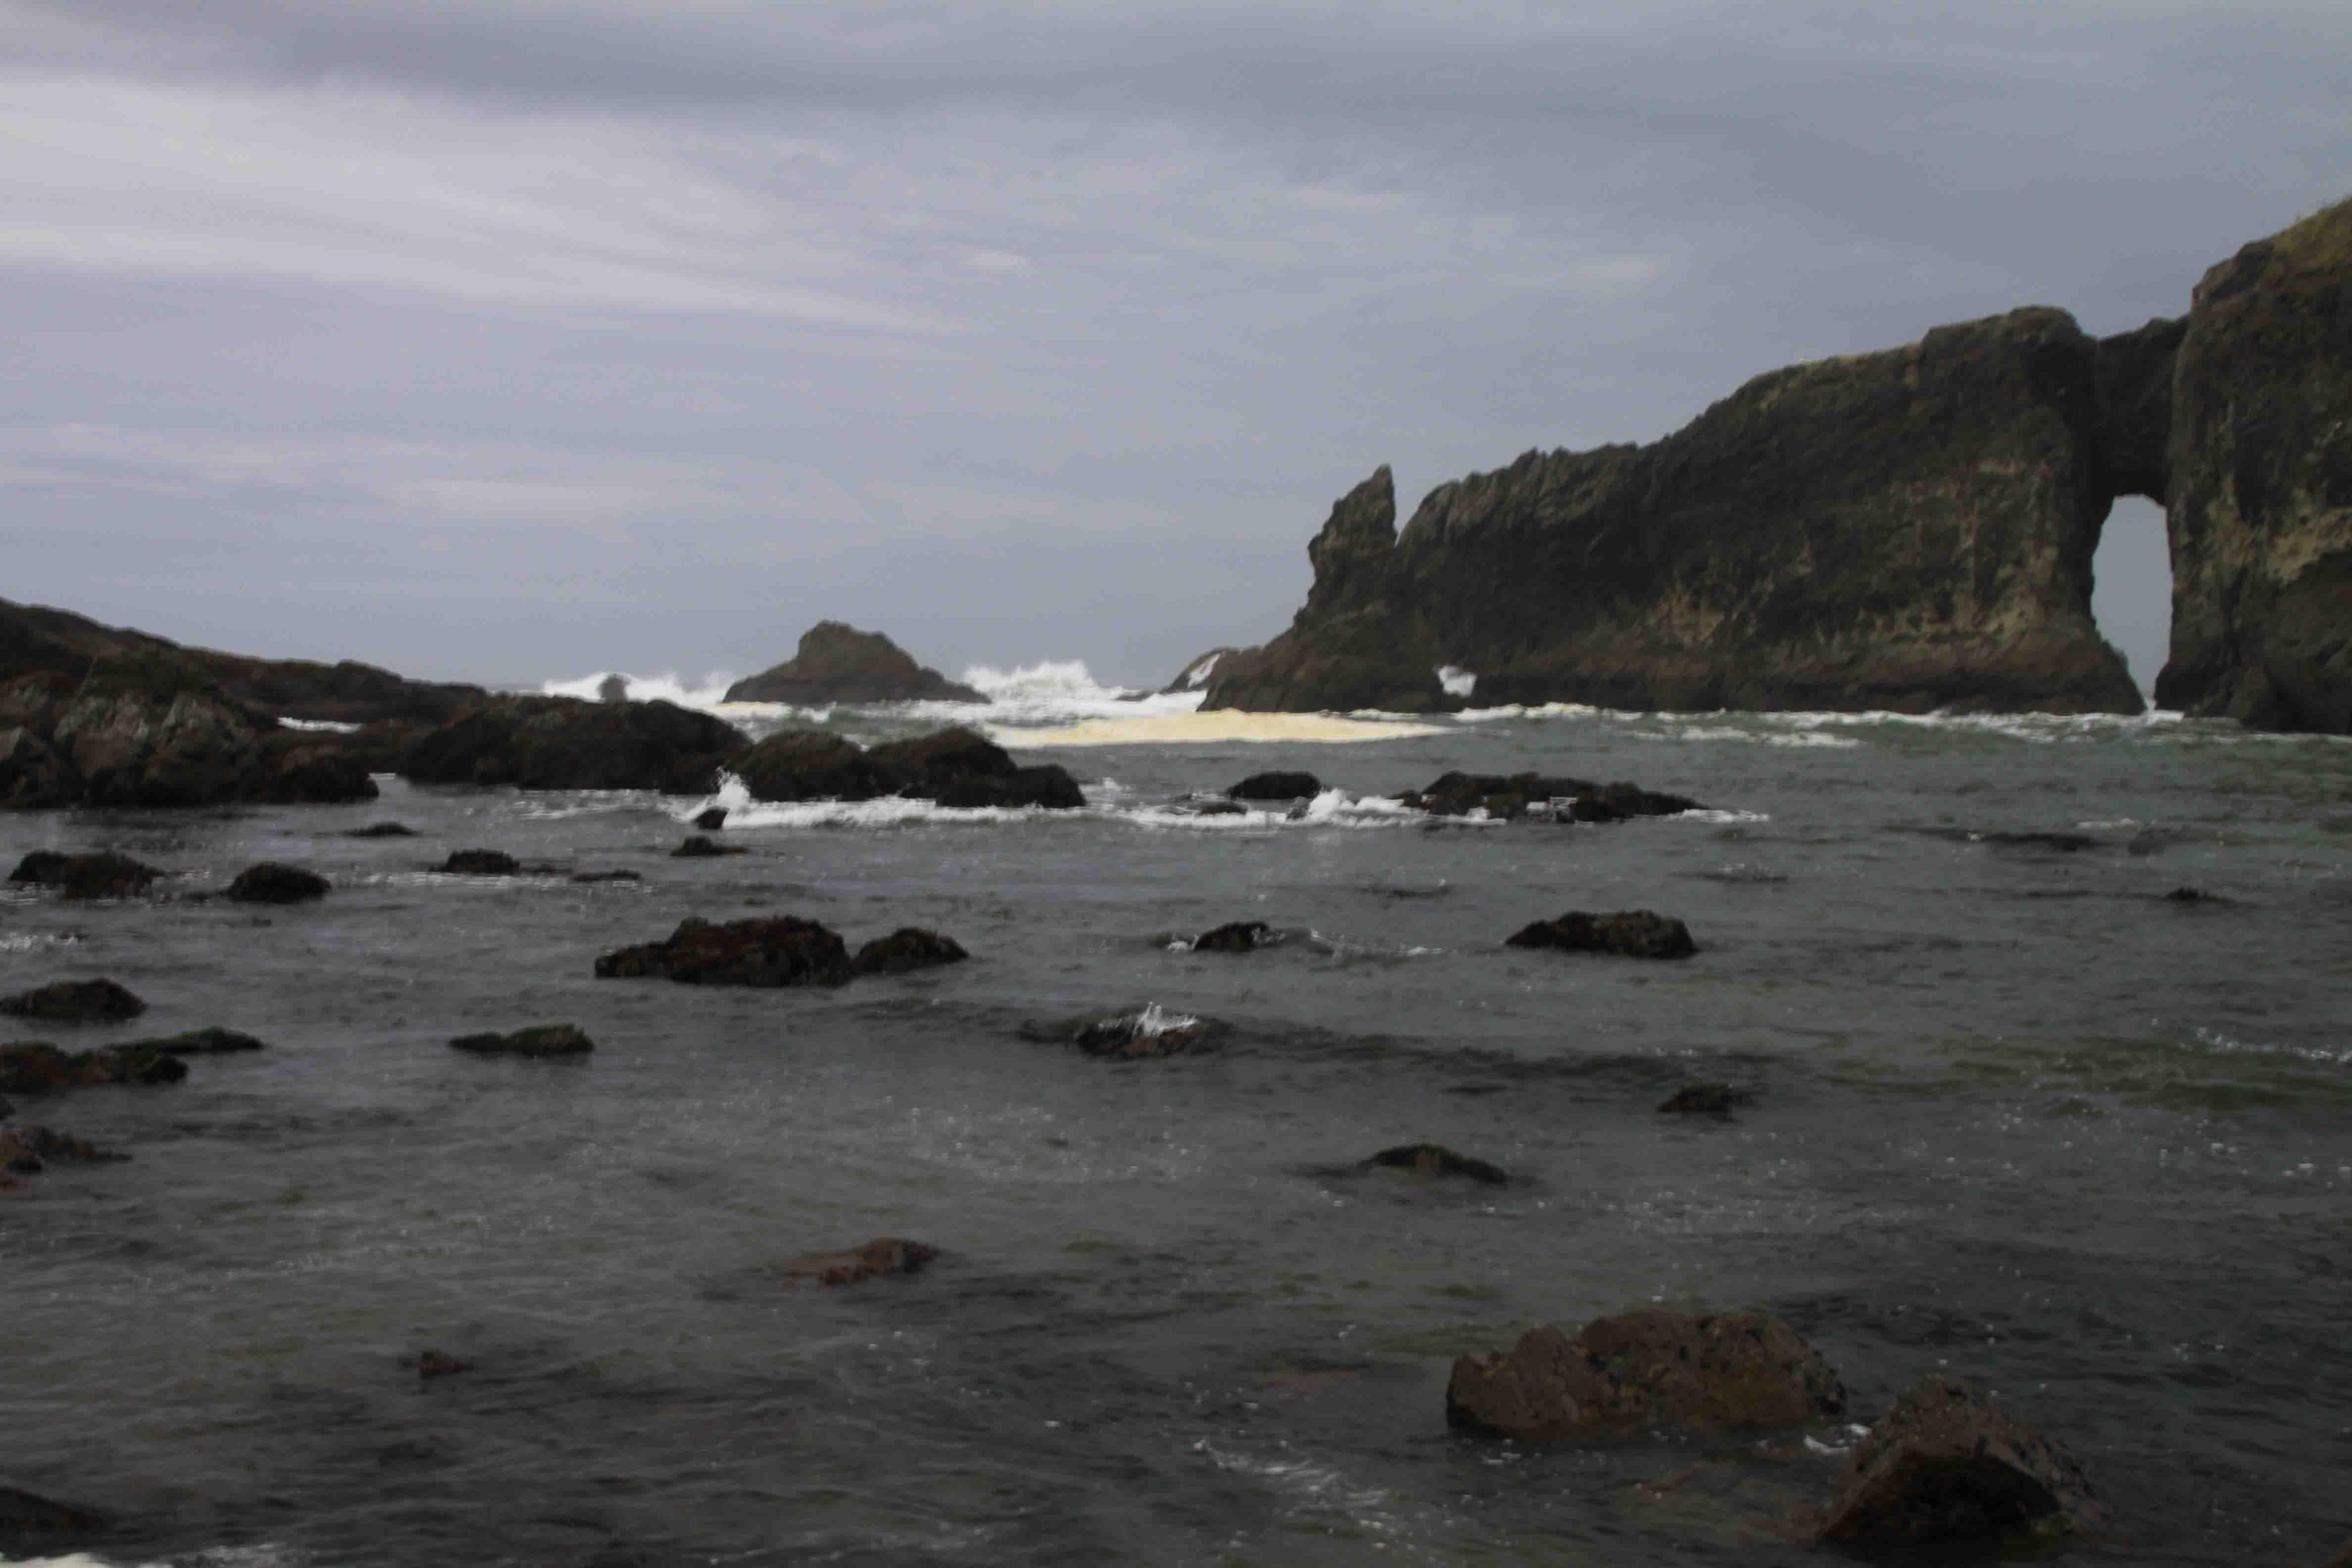 second beach on the olympic peninsula